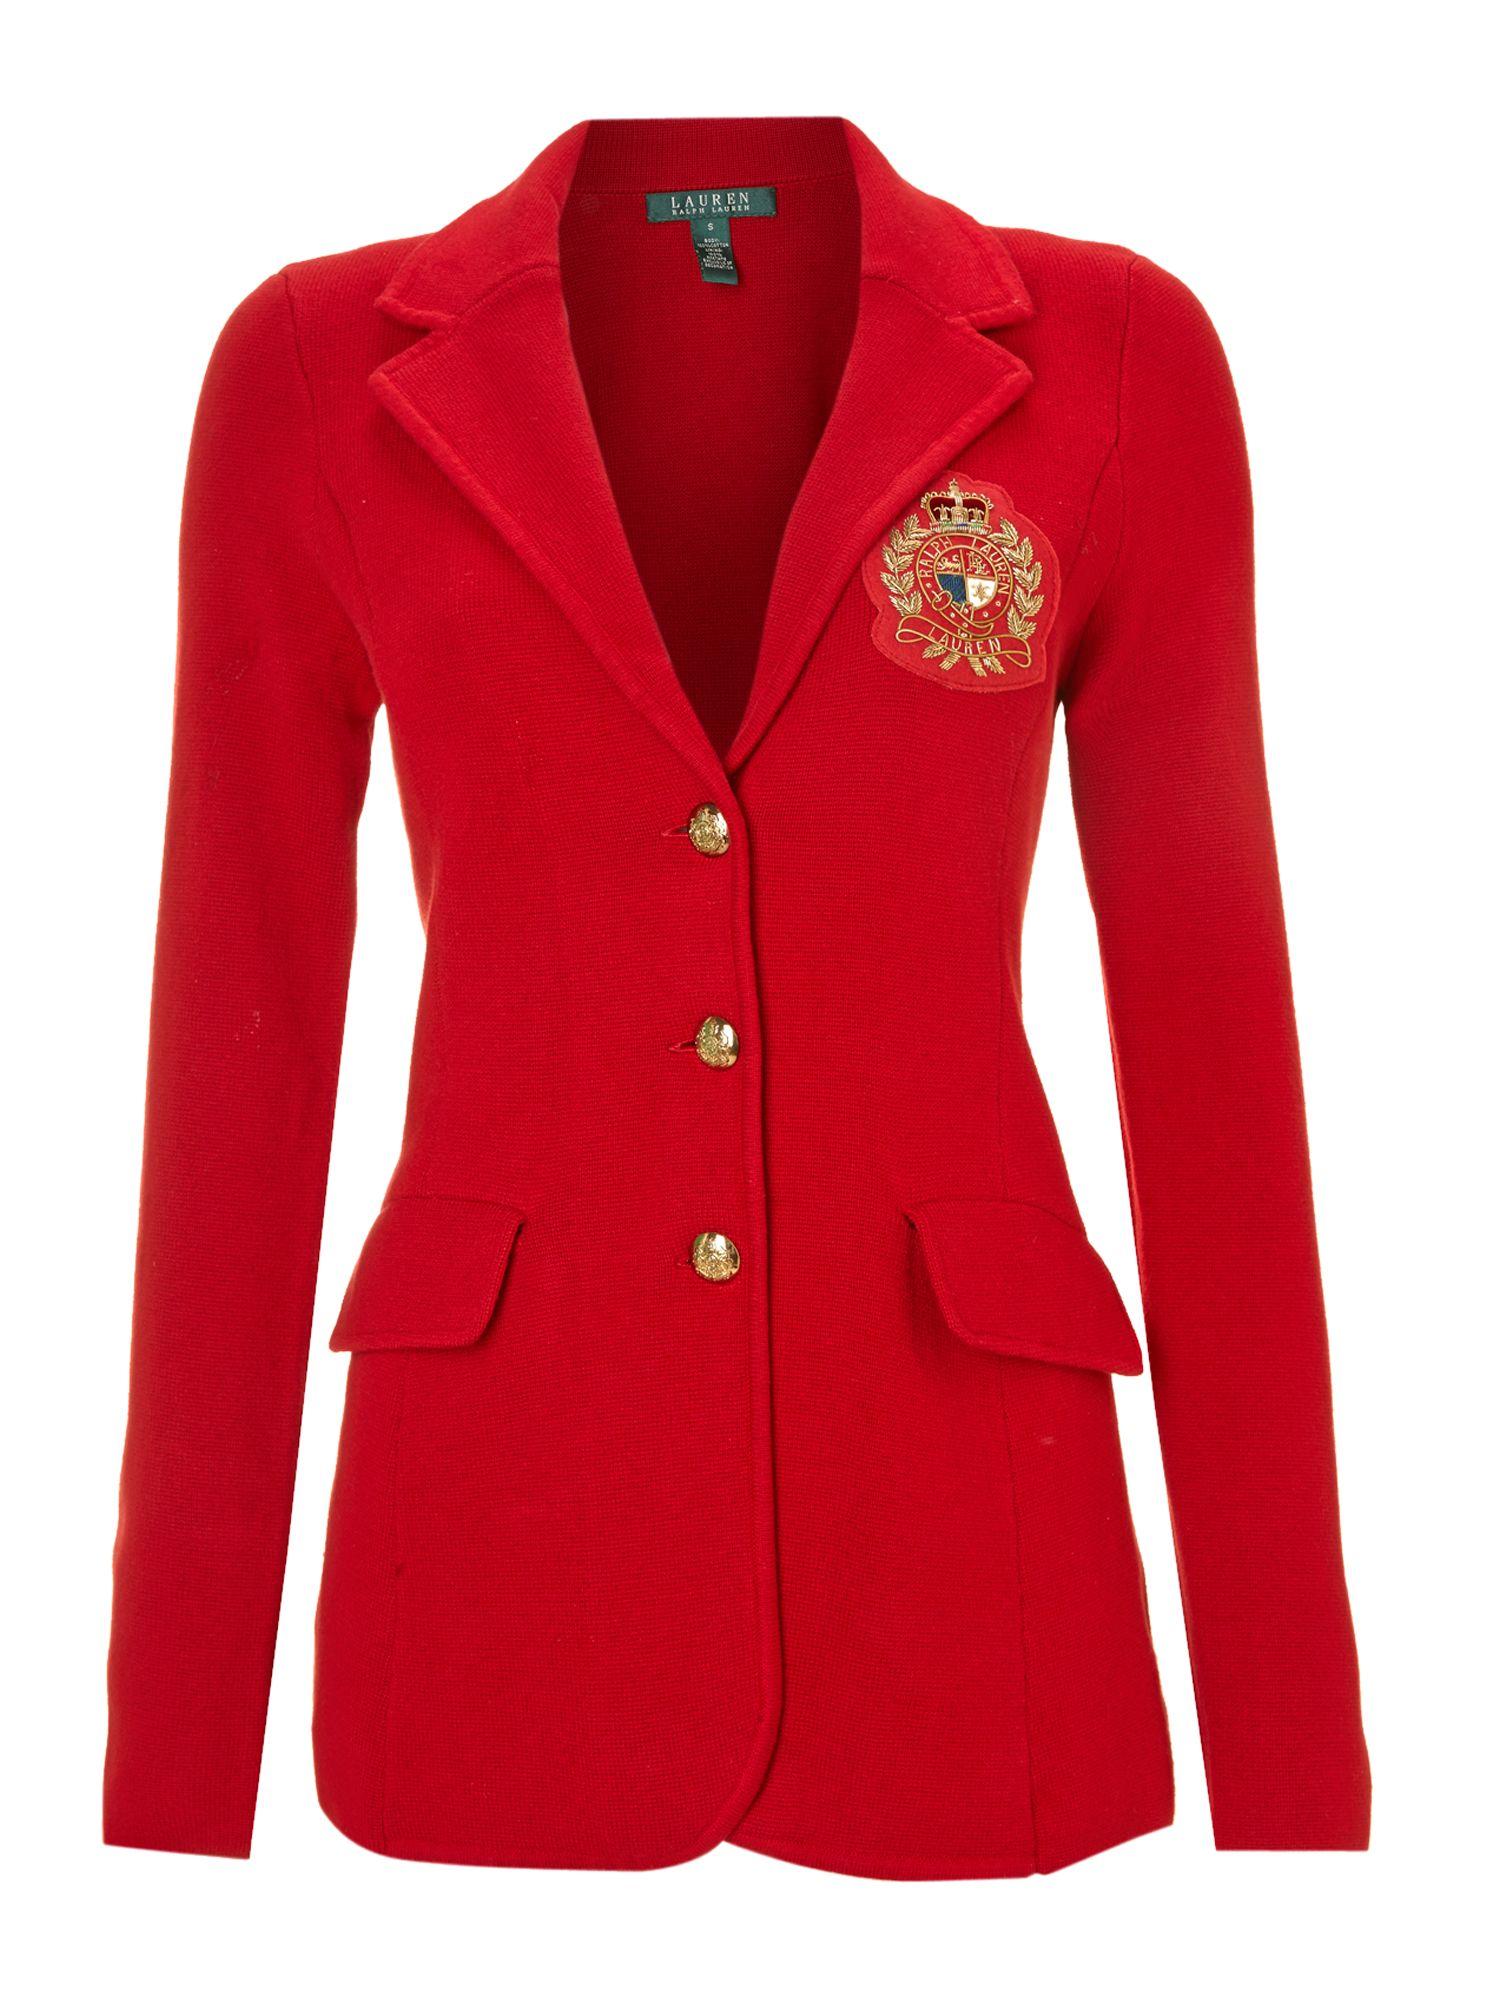 lyst lauren by ralph lauren blazer with crest detail in red. Black Bedroom Furniture Sets. Home Design Ideas